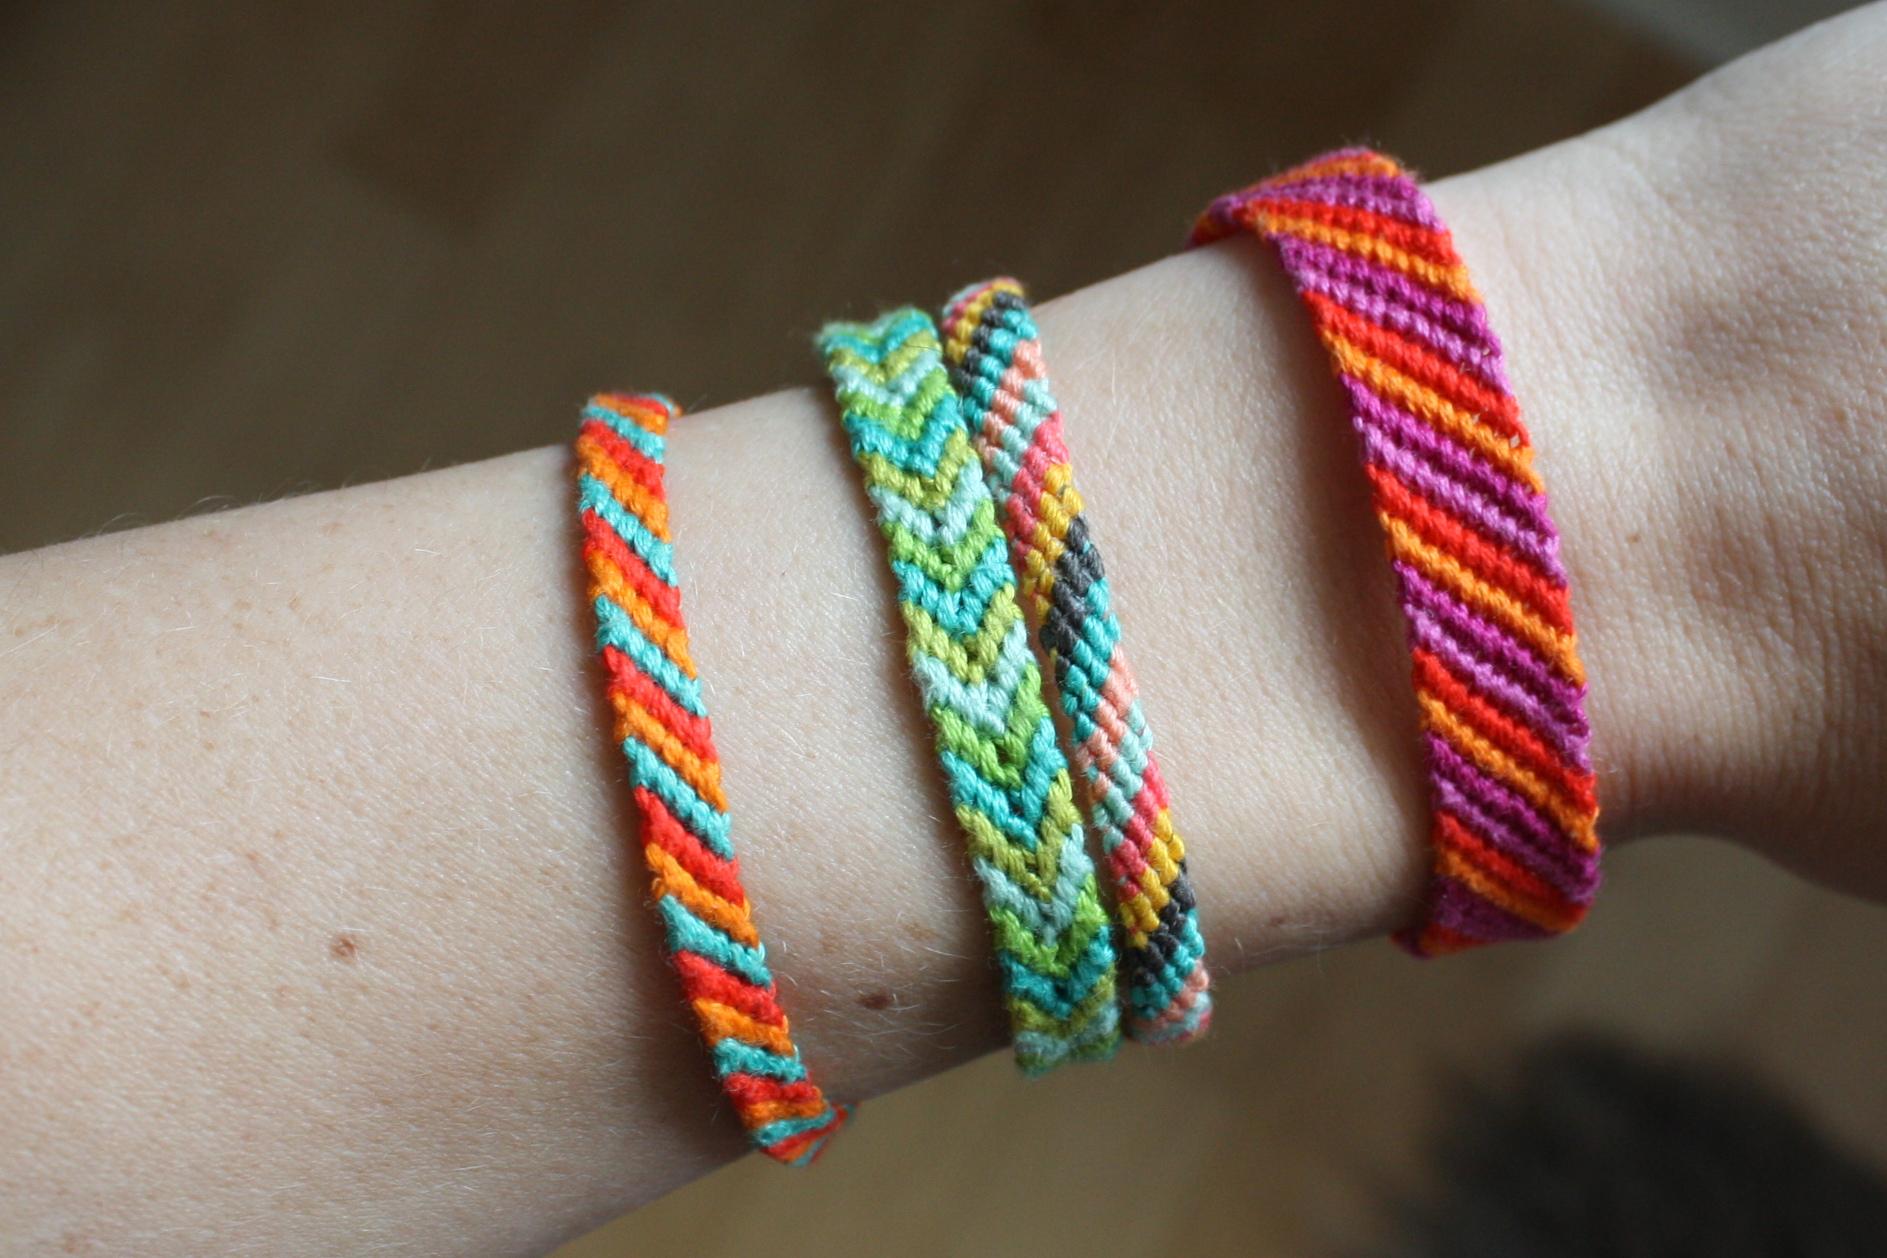 enJOY it by Elise Blaha Cripe: friendship bracelets / summer story two.